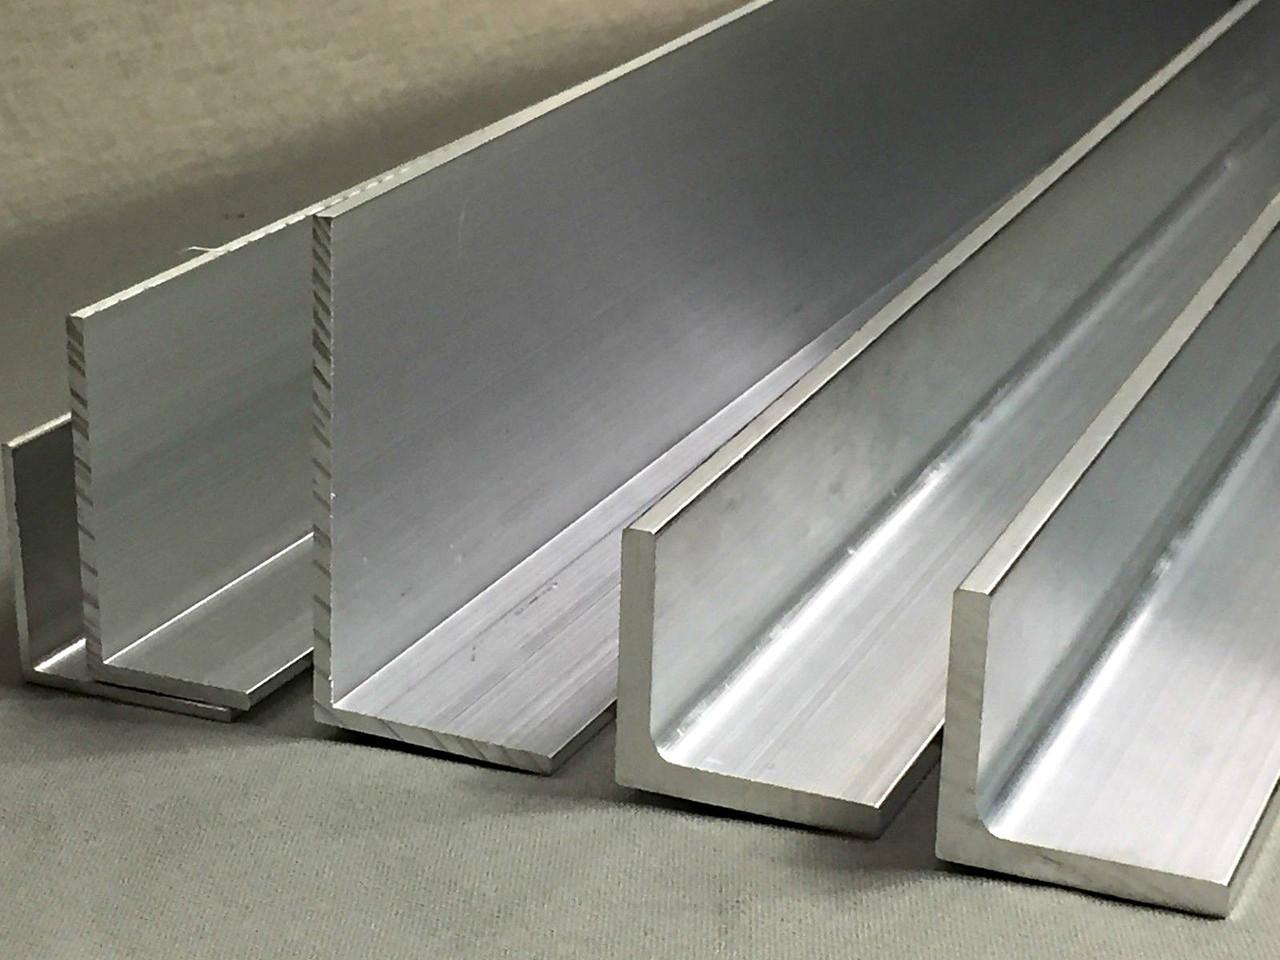 Южноукраинск алюминиевый уголок 1 2 3 4 5 6 7 8 мм алюминий марки АД31